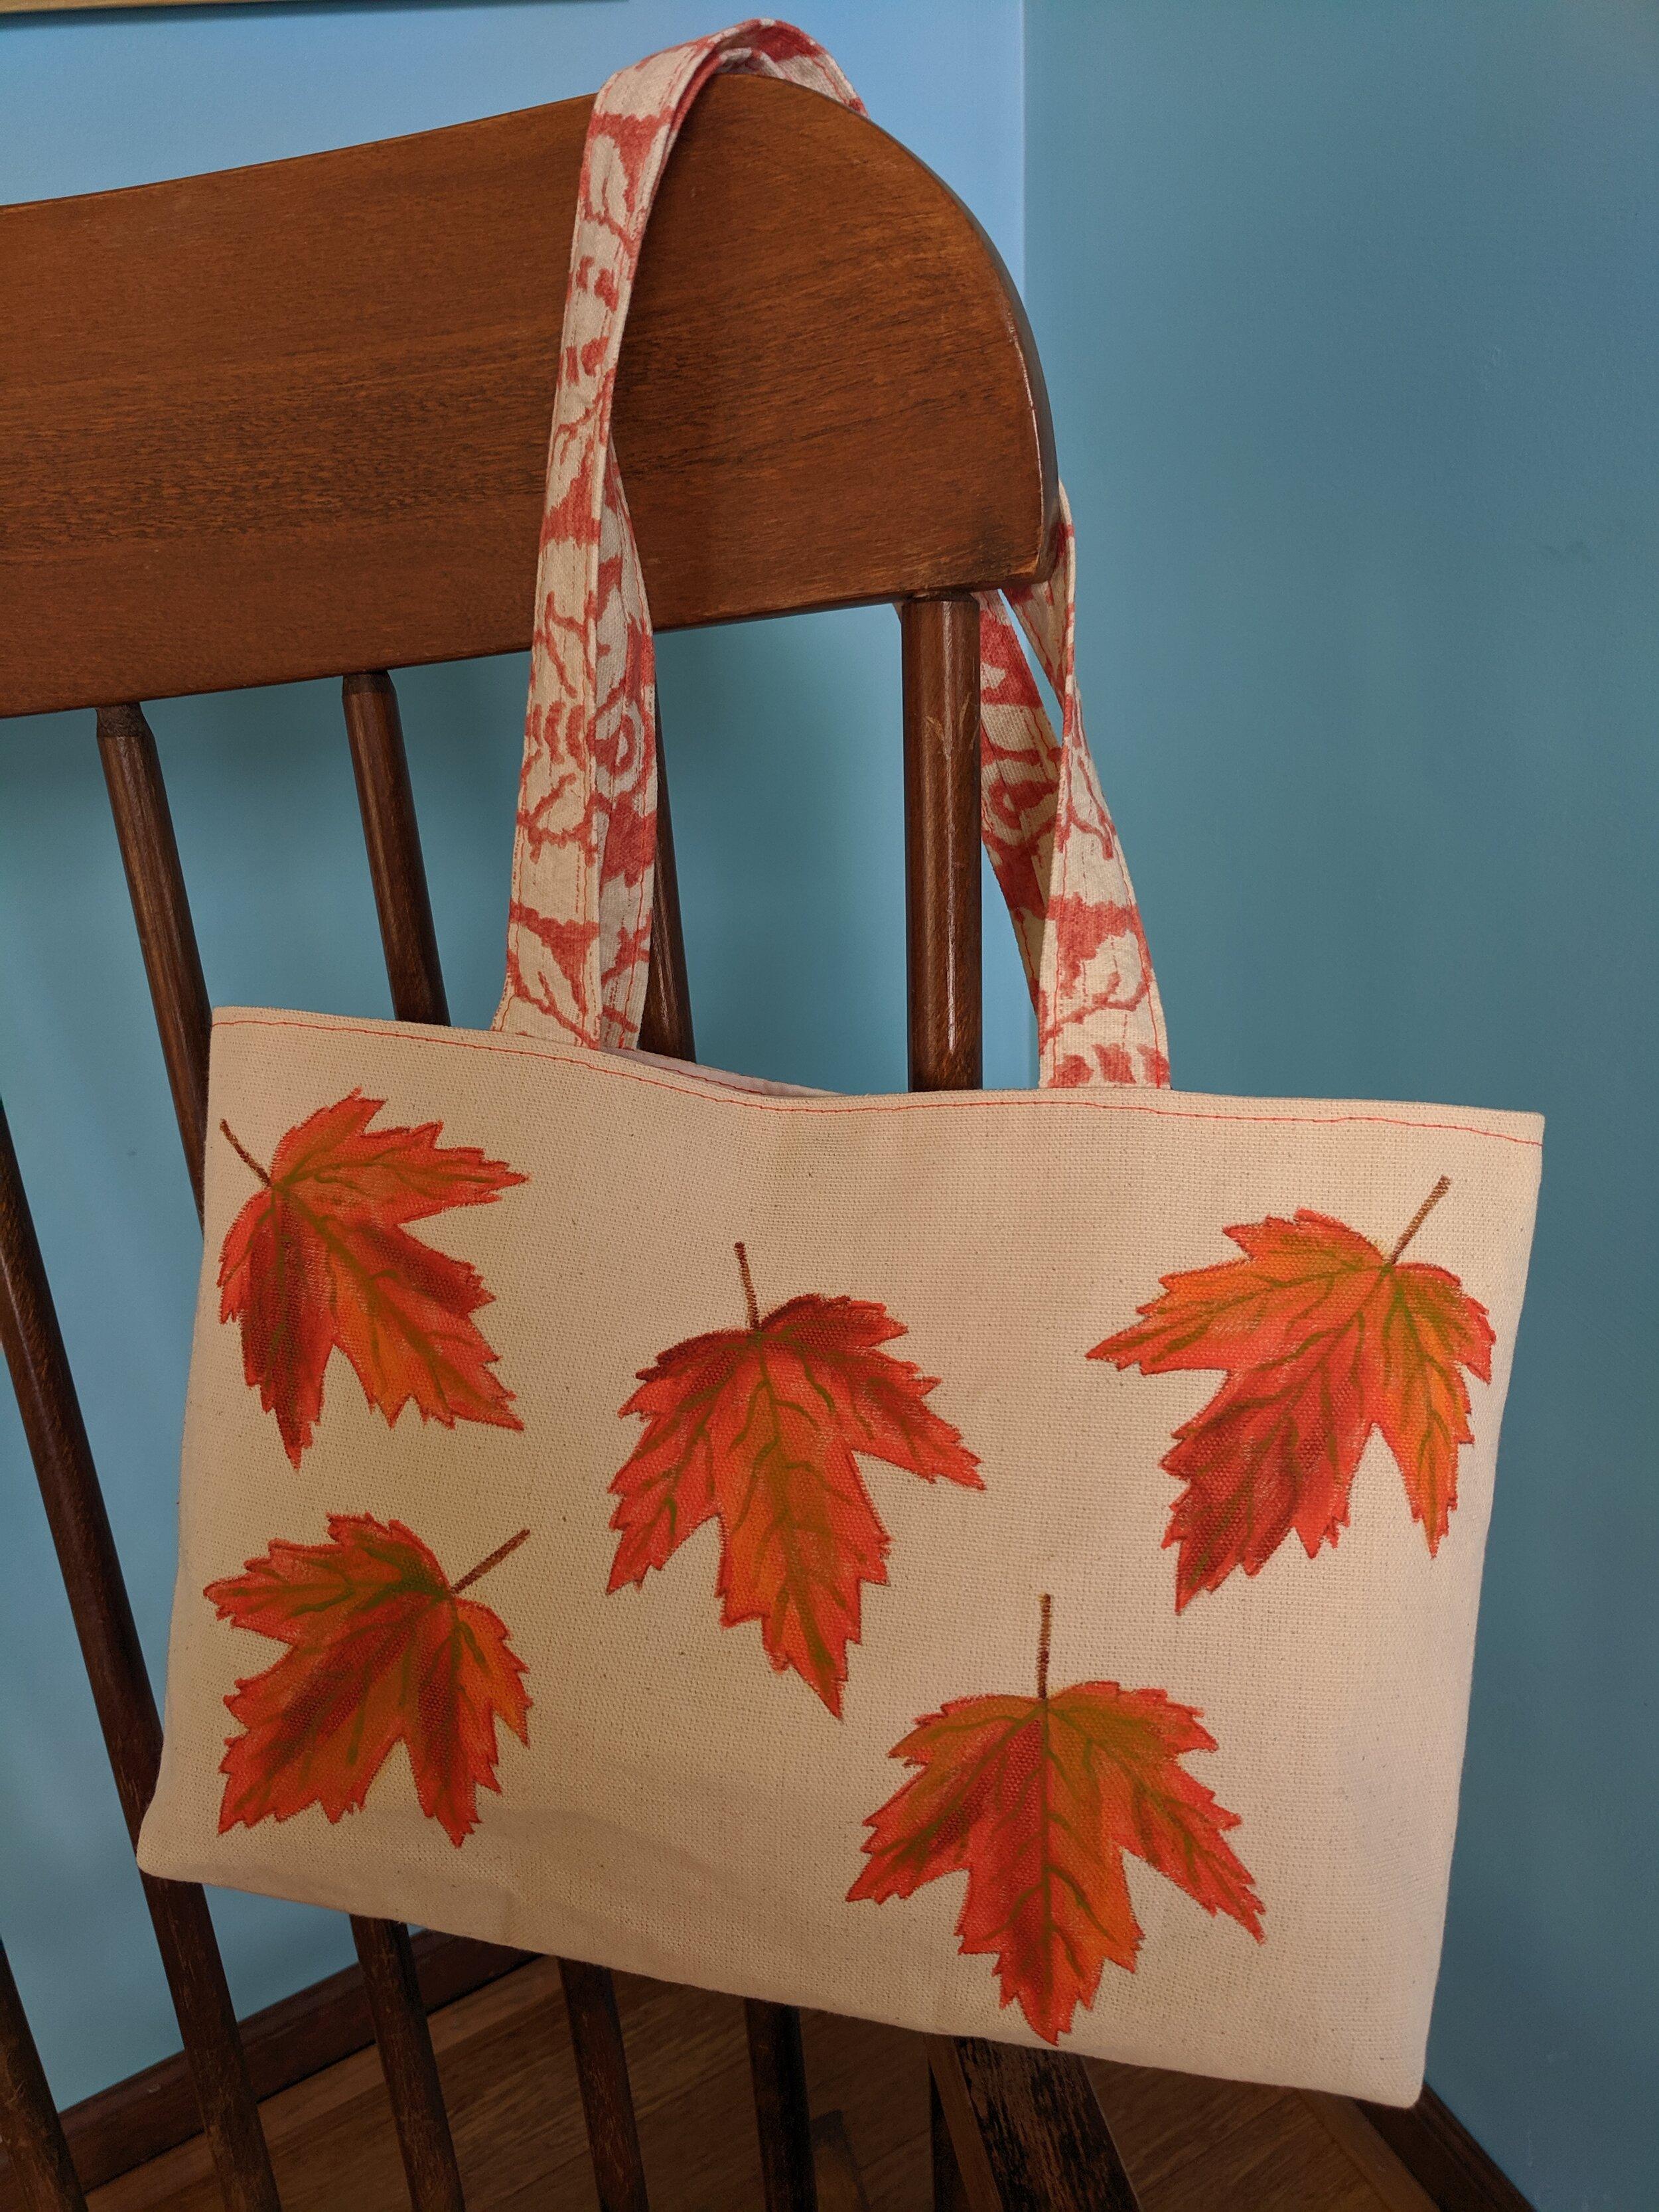 5 Maple Leaves Bag